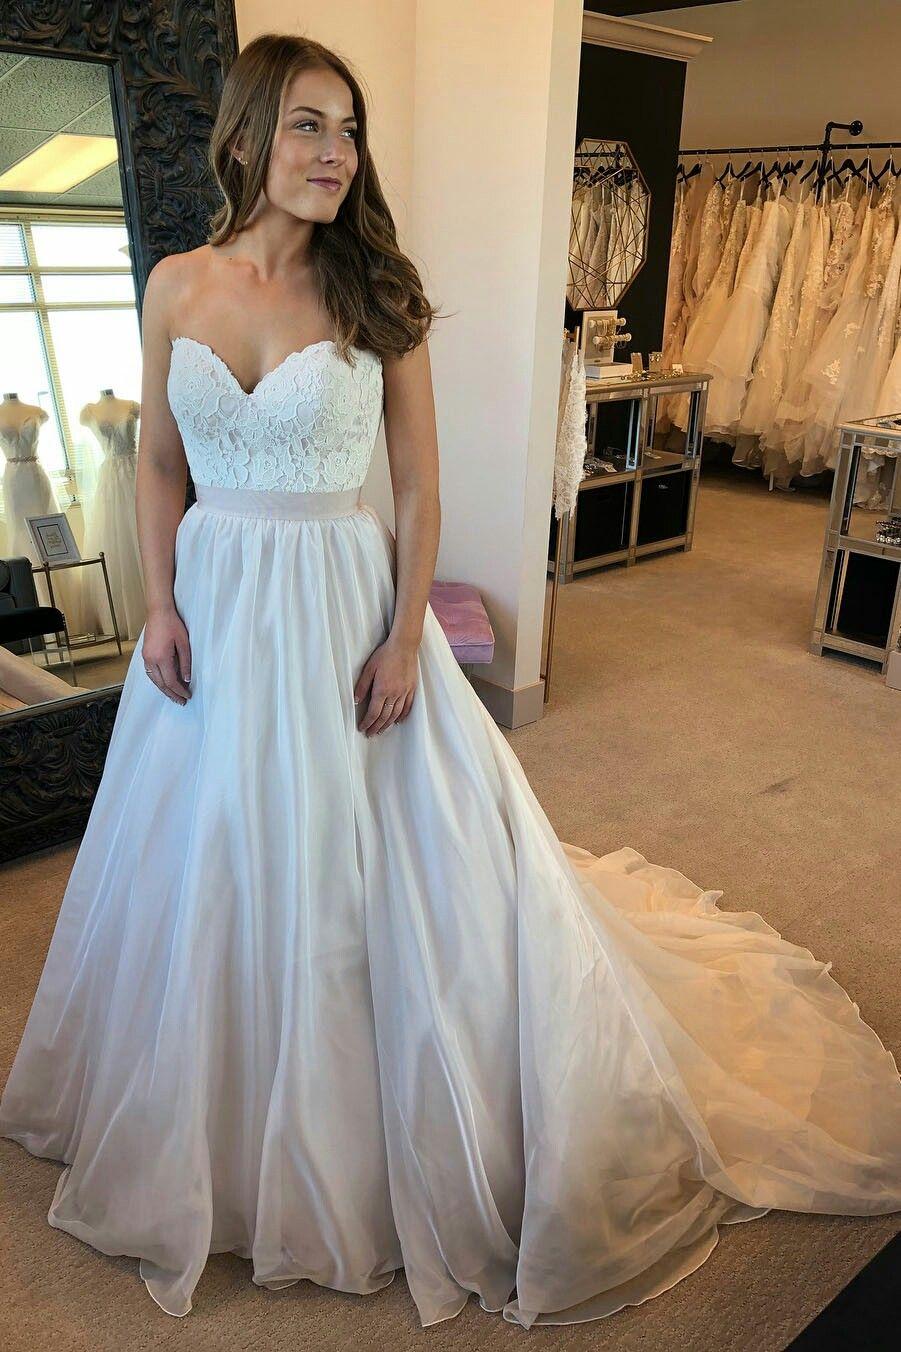 Pin by jocelyn rutherford on weddinguc pinterest wedding dresses